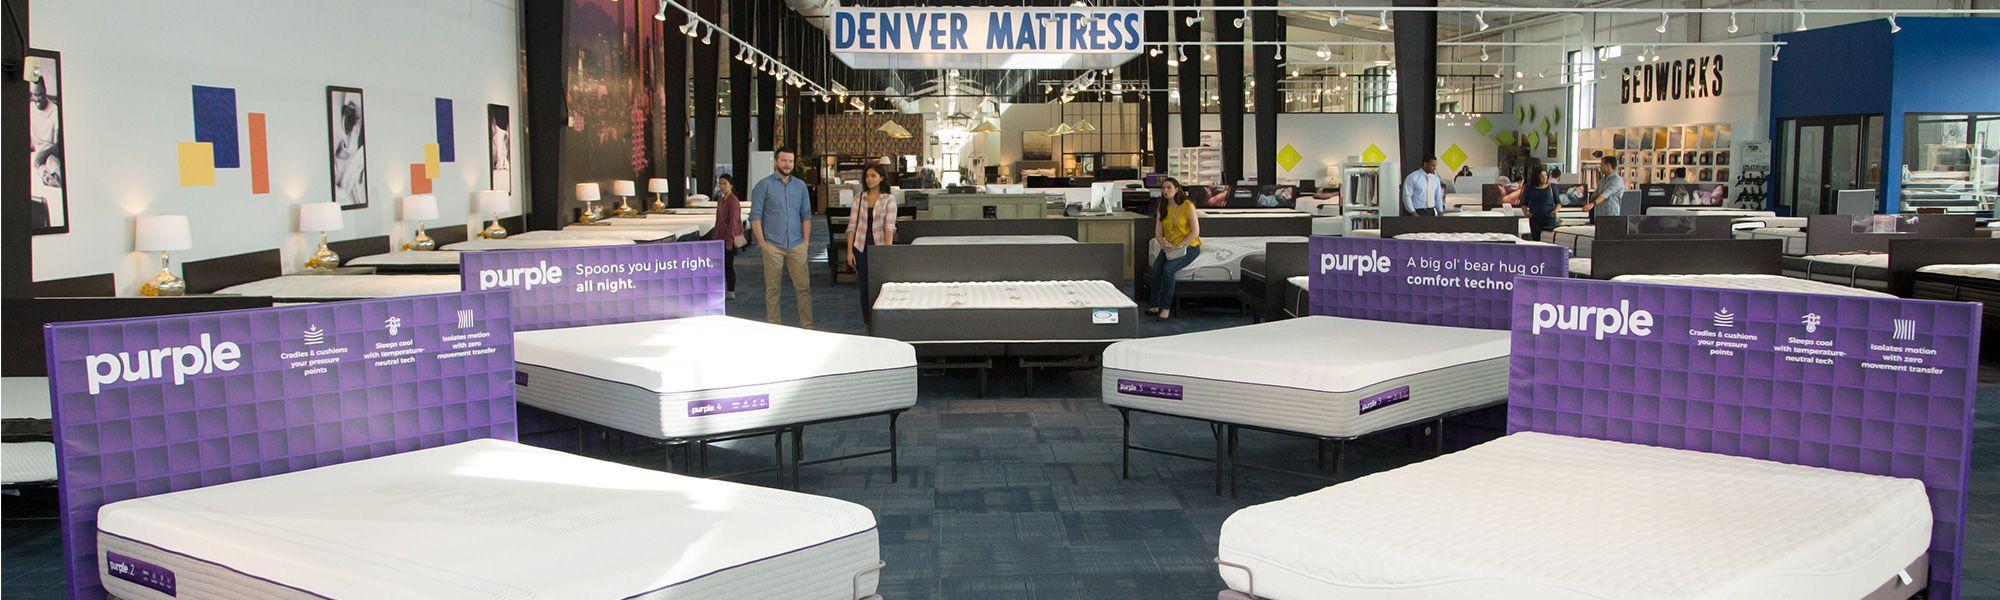 Purple in Denver Mattress Store